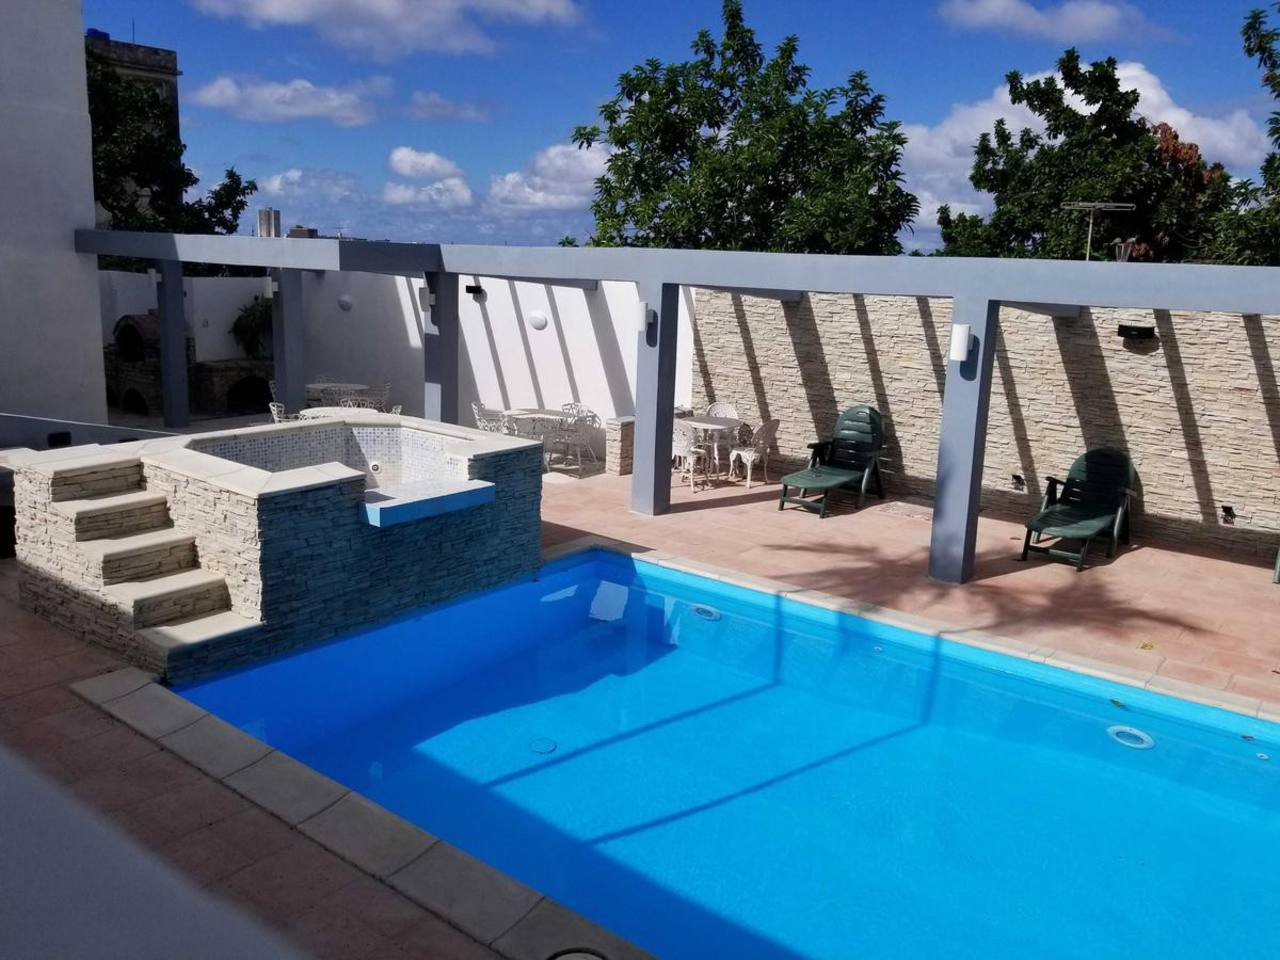 Villa Don Teto Suite & 8 Rooms: Great Havana View photo 5787876